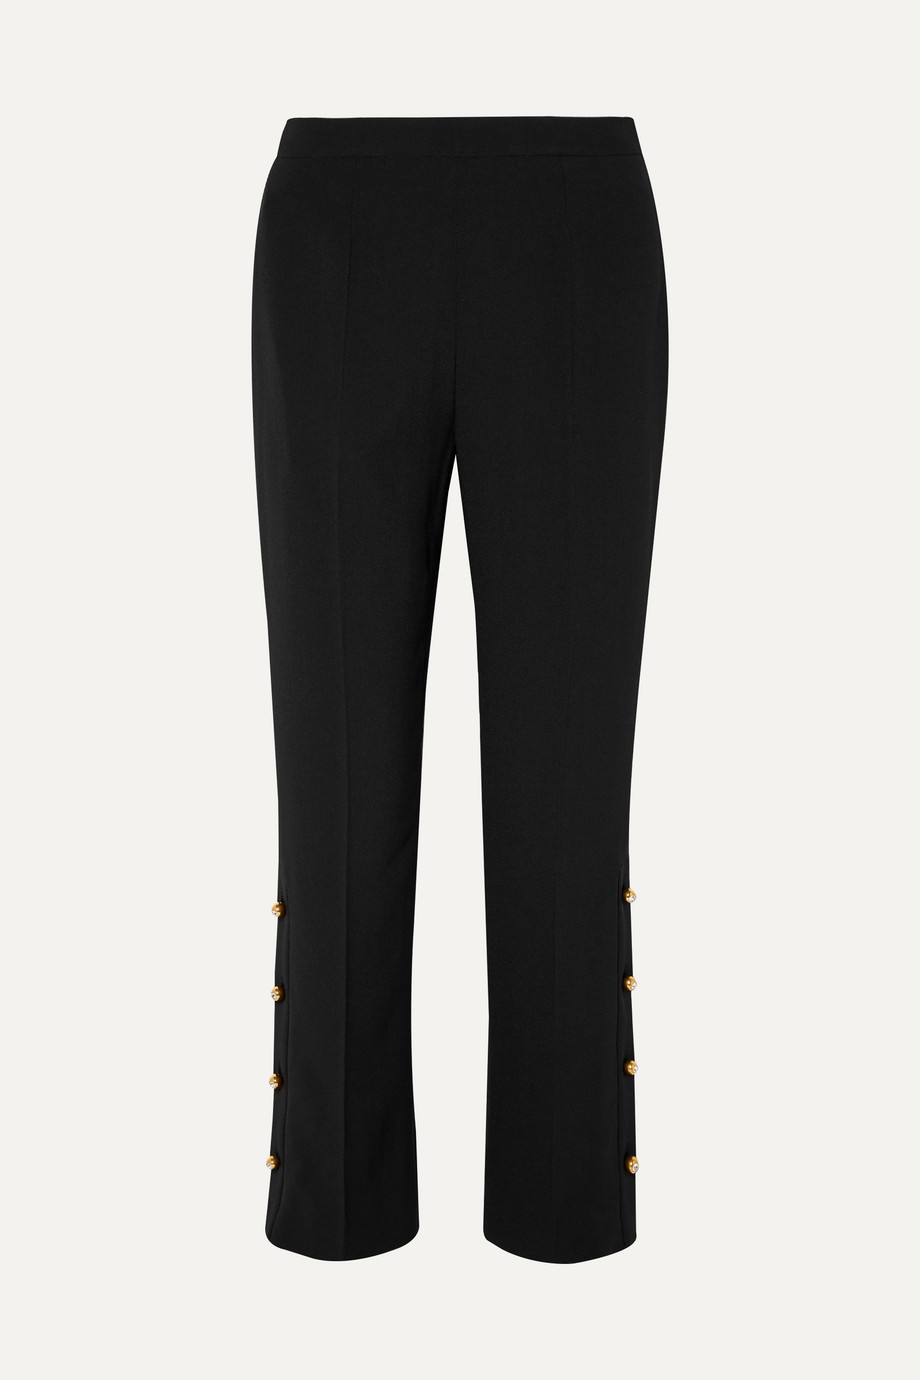 Prada Button-embellished crepe wide-leg pants